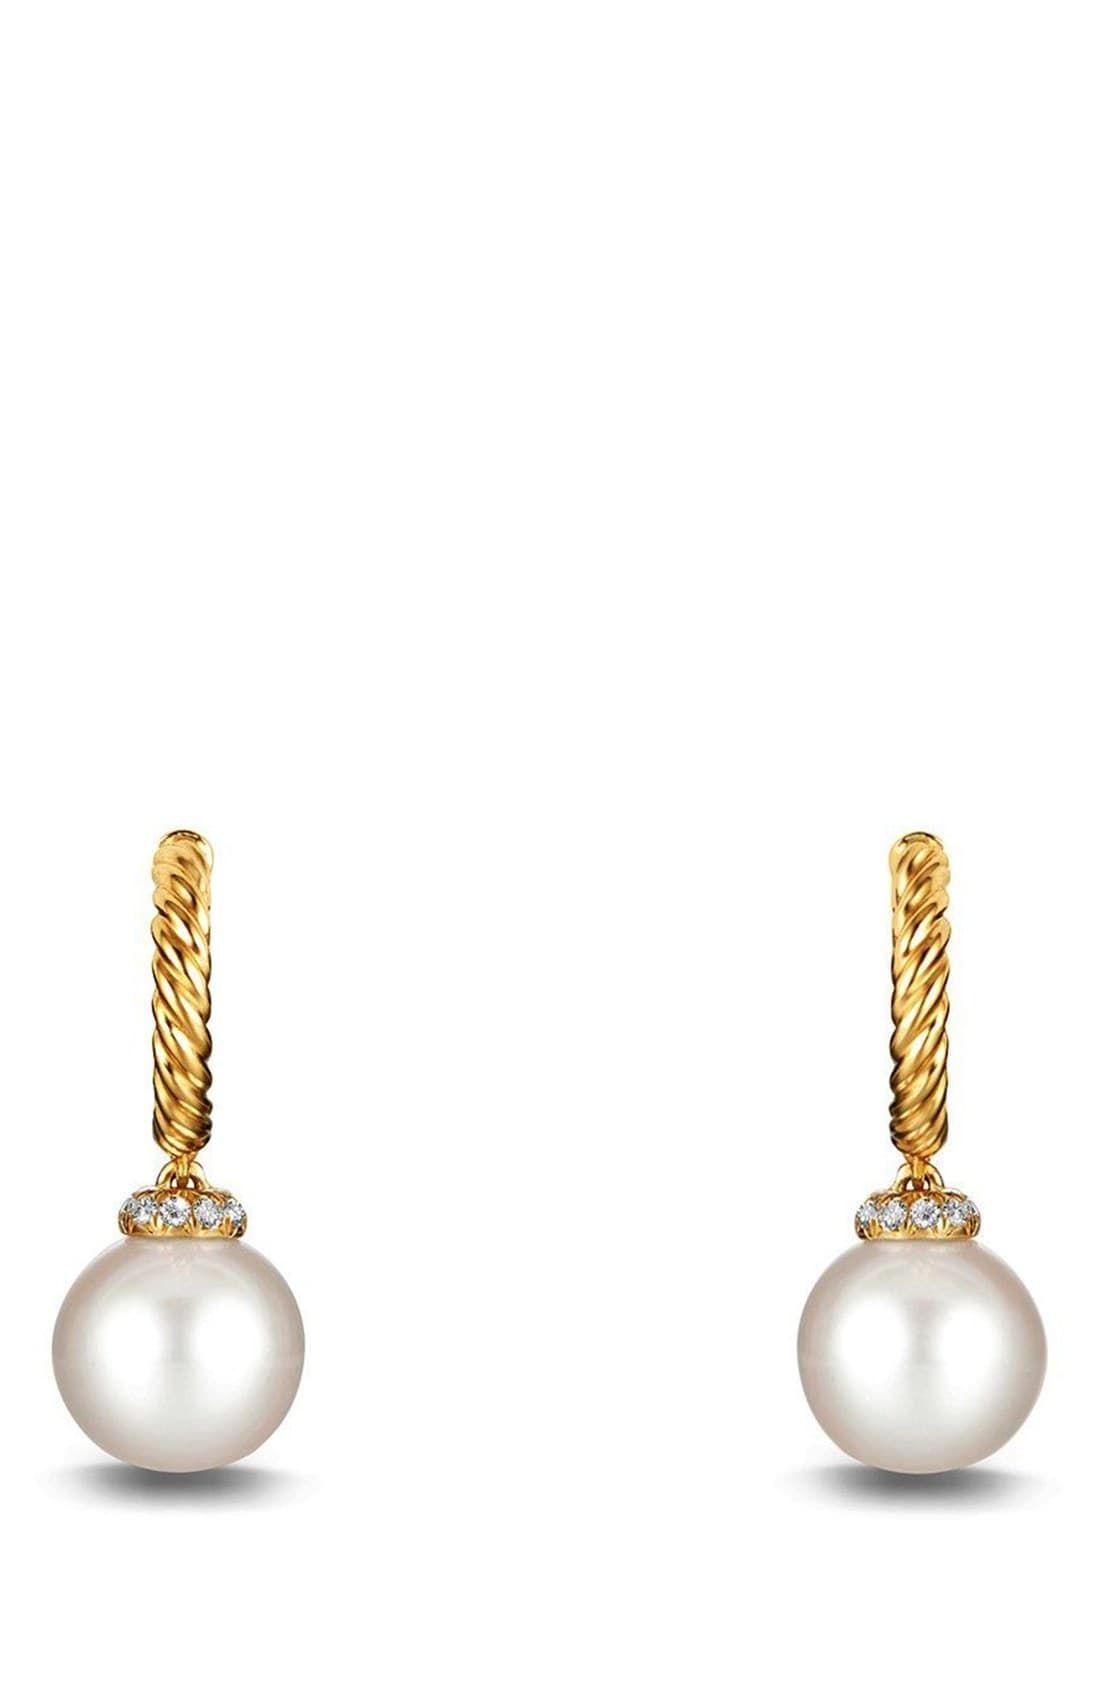 1b30b7d38feae Women's David Yurman 'Solari' Hoop Earring With Diamonds And Pearls ...